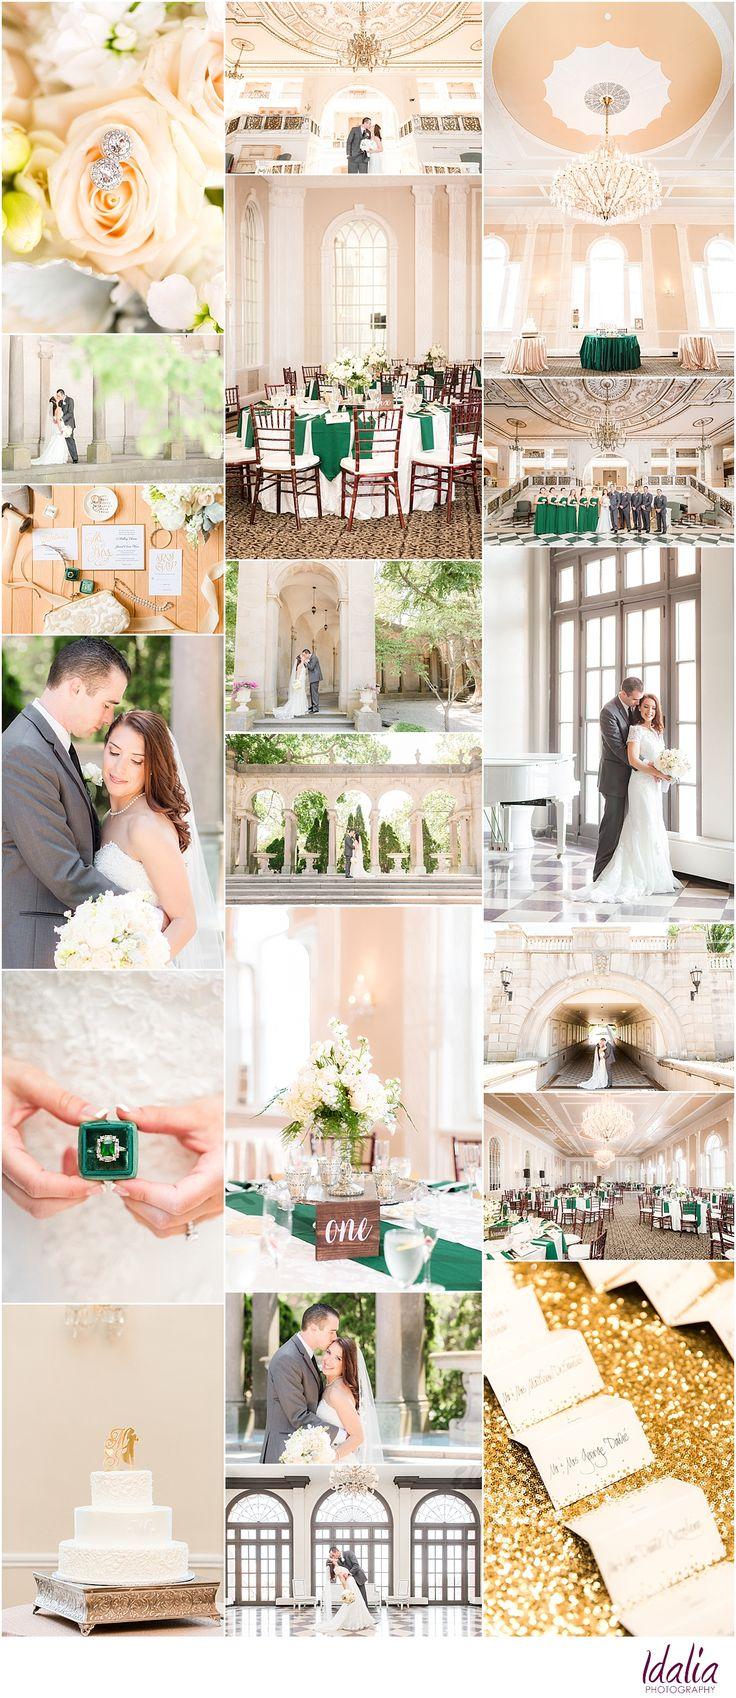 wedding venues asbury park nj%0A Berkeley Oceanfront Hotel Wedding Venue   Asbury Park  NJ   Photo by Idalia  Photography